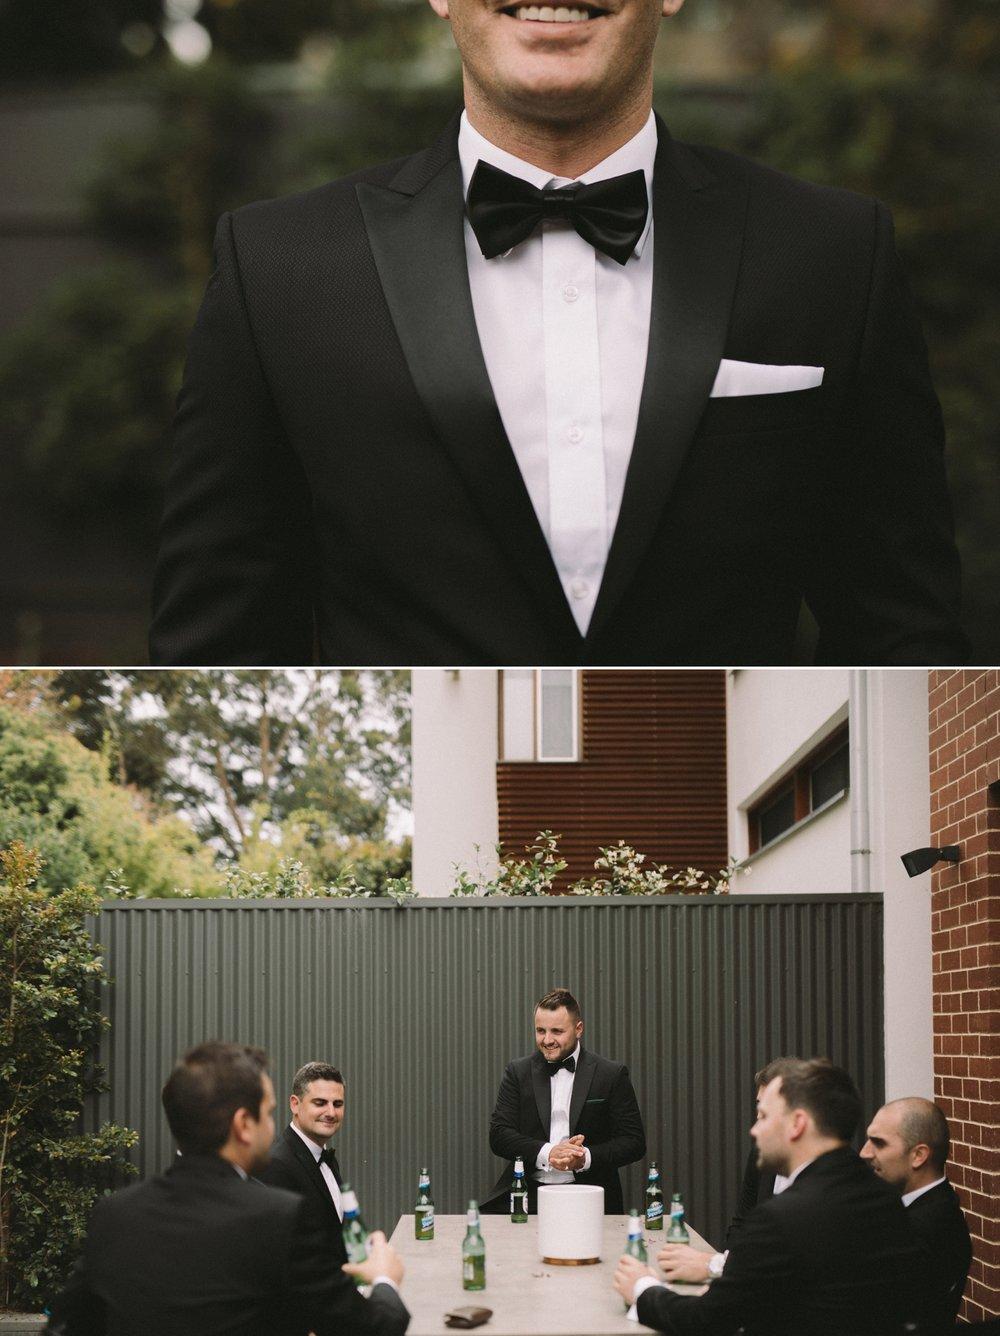 Rebecca & Daniel - Adelaide Hills Private Property Wedding Photographer - Fine Art Wedding Photographer Australia - Katherine Schultz - www.katherineschultzphotography.com_0005.jpg